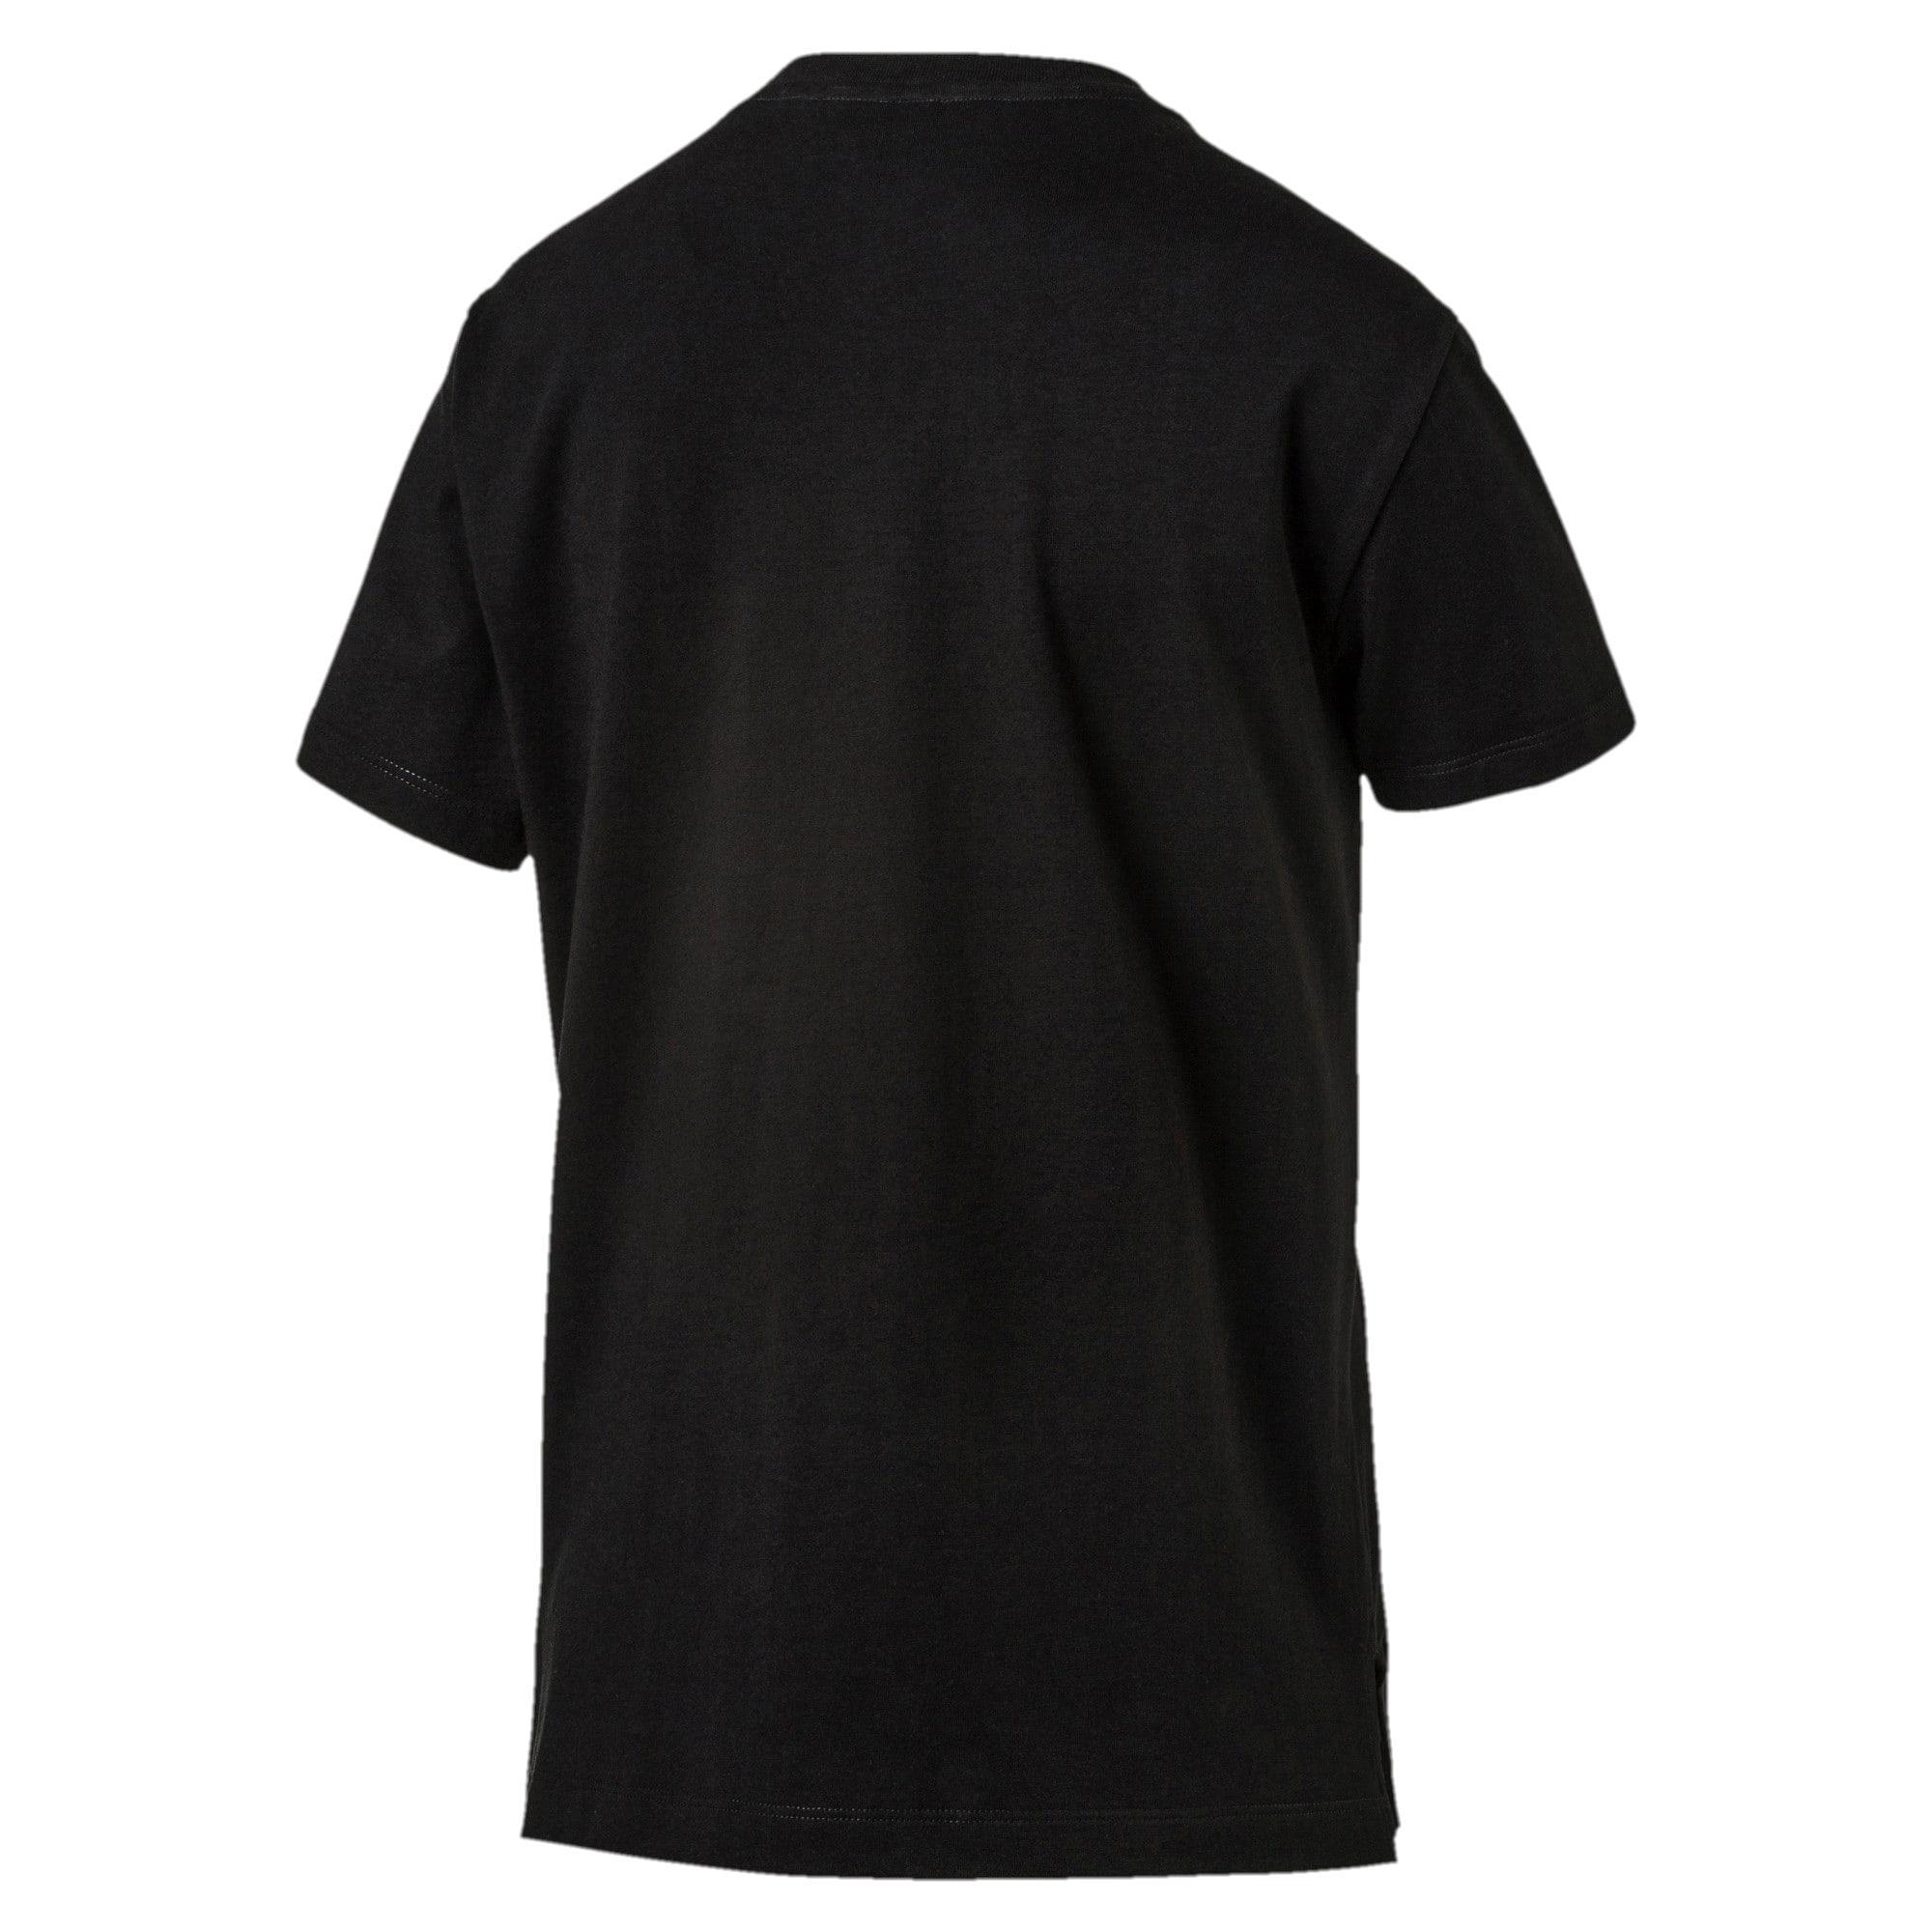 Miniatura 1 de Camiseta Classics con logotipo para mujer, Cotton Black-gold, mediano